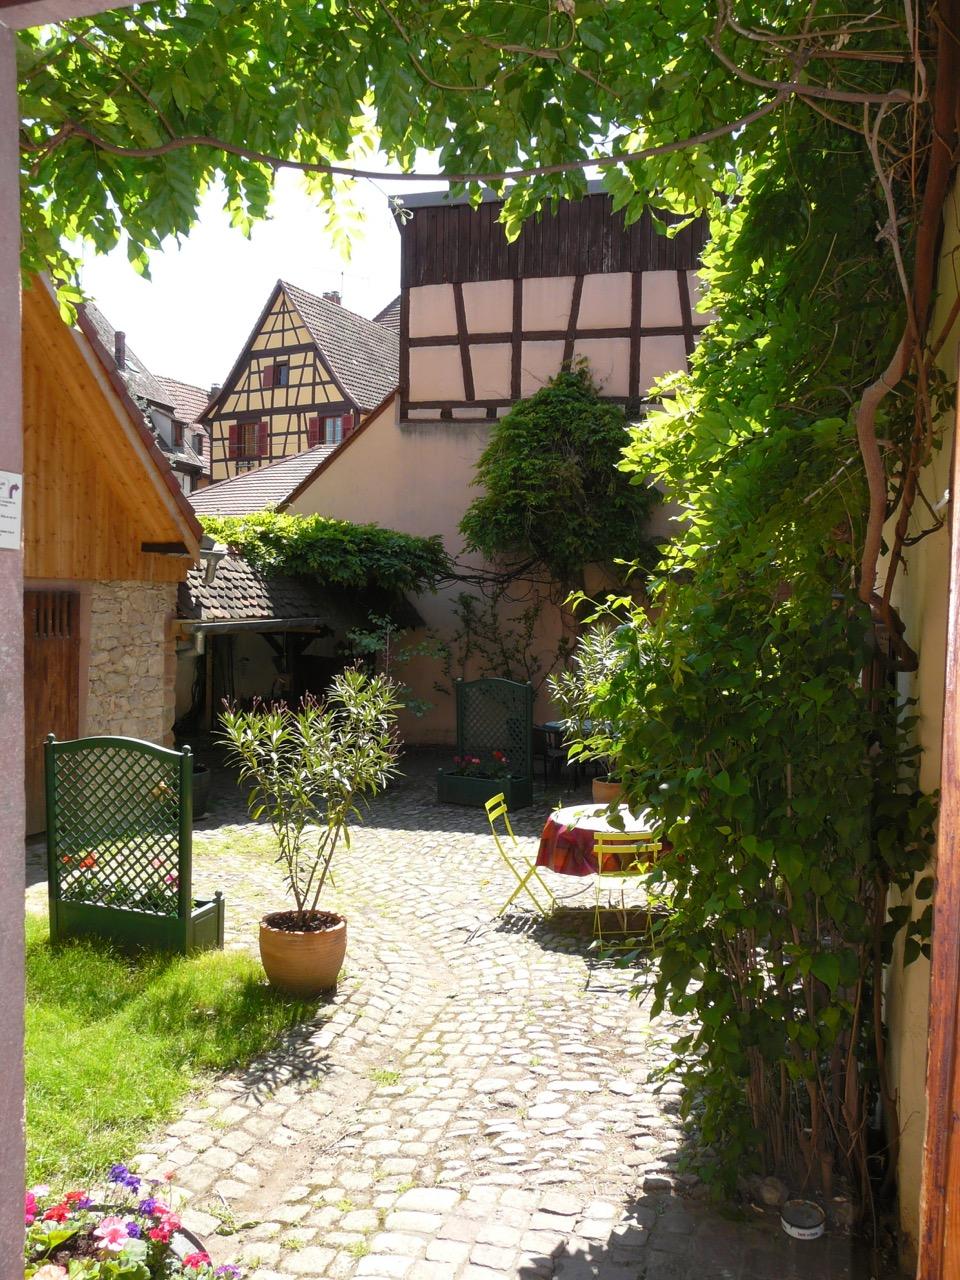 Location de vacances - Gîte Alsacien - Kouglof (copie)